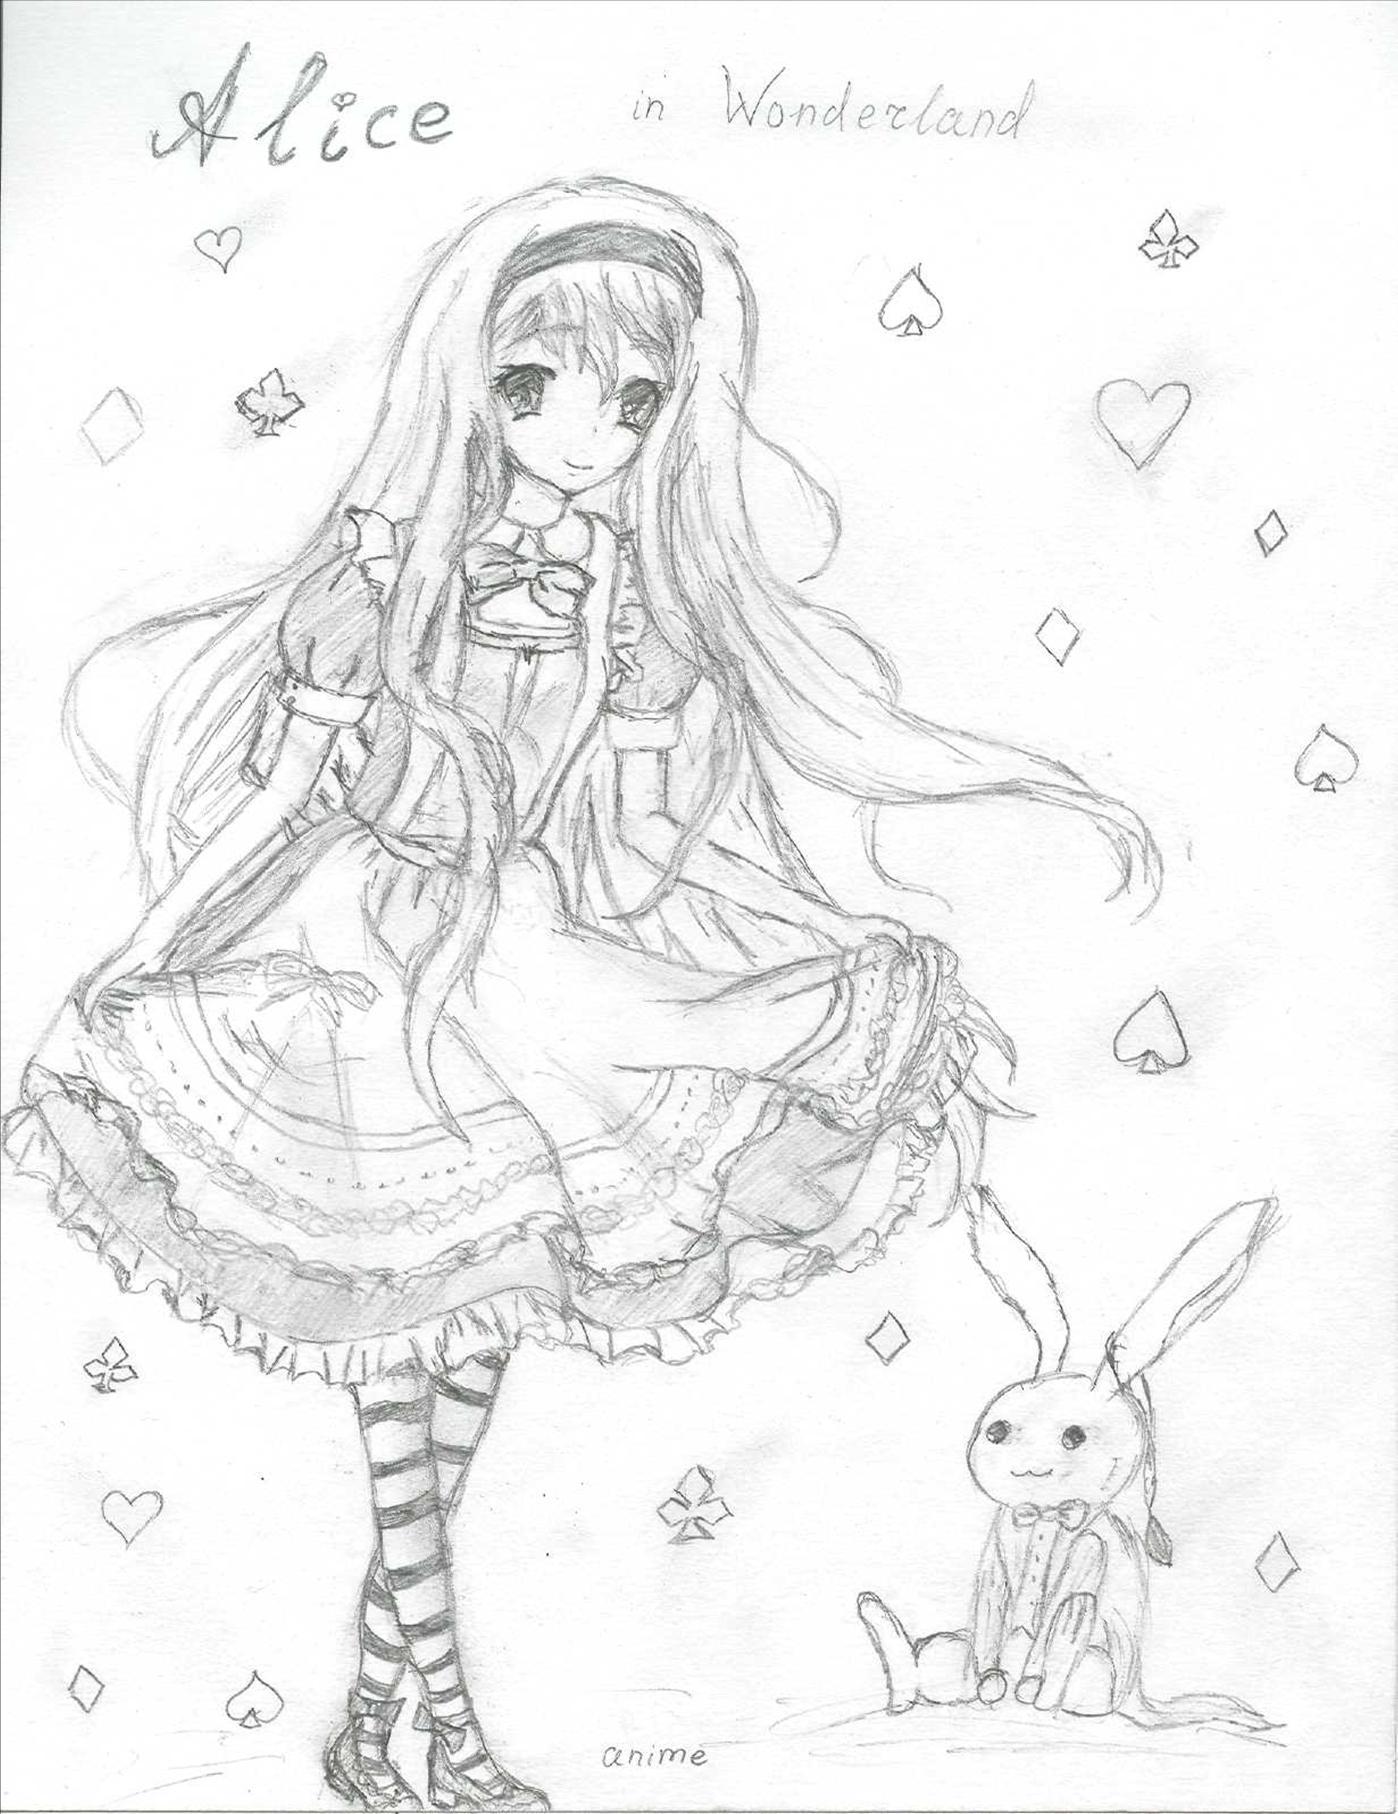 Anime Alice in Wonderland Drawing